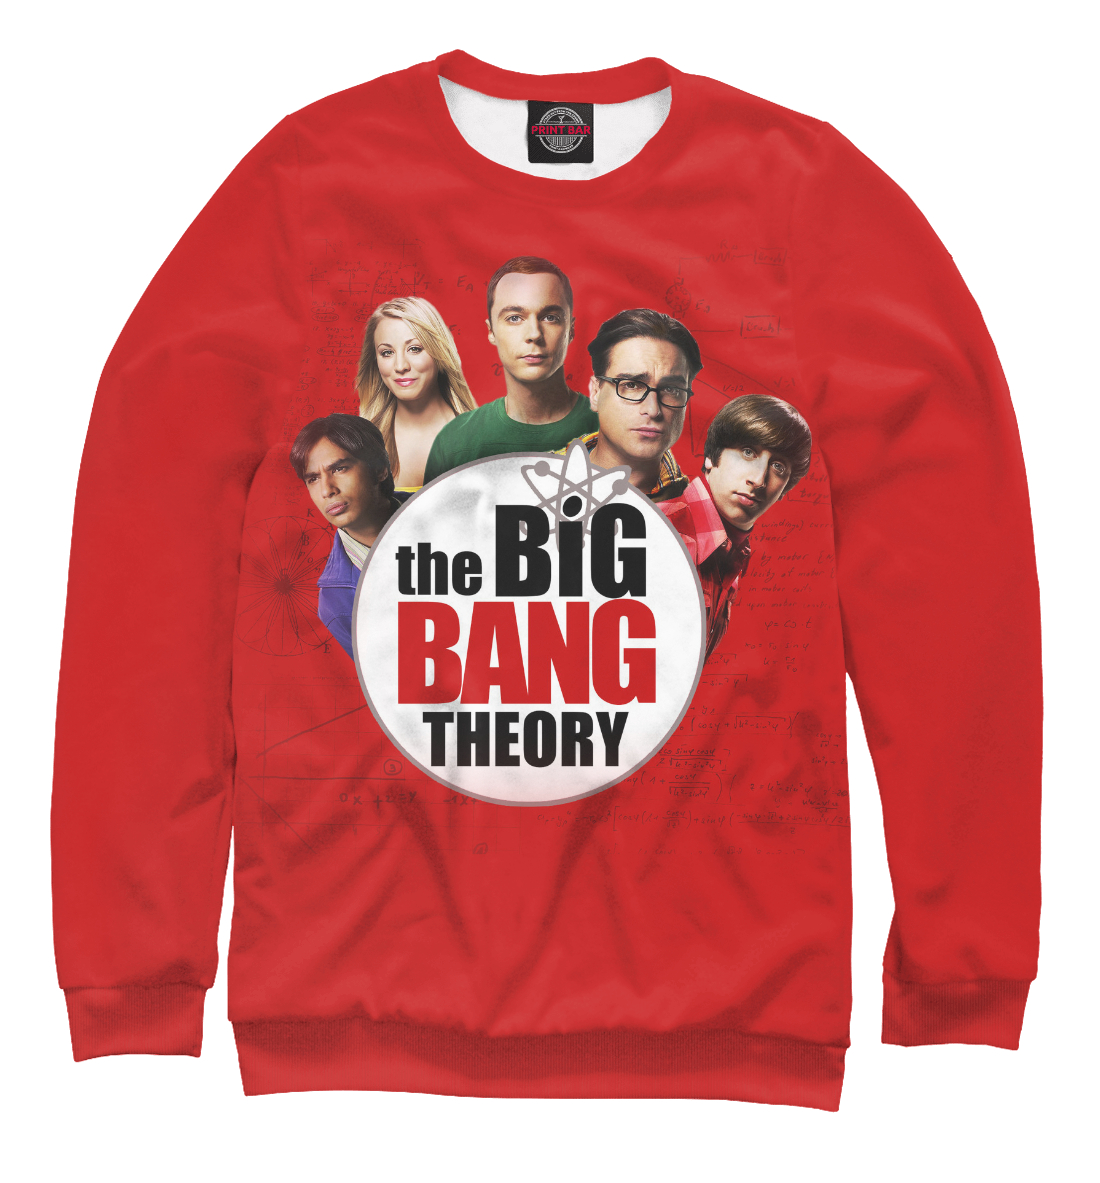 Купить The Big Bang Theory, Printbar, Свитшоты, TEO-279851-swi-2